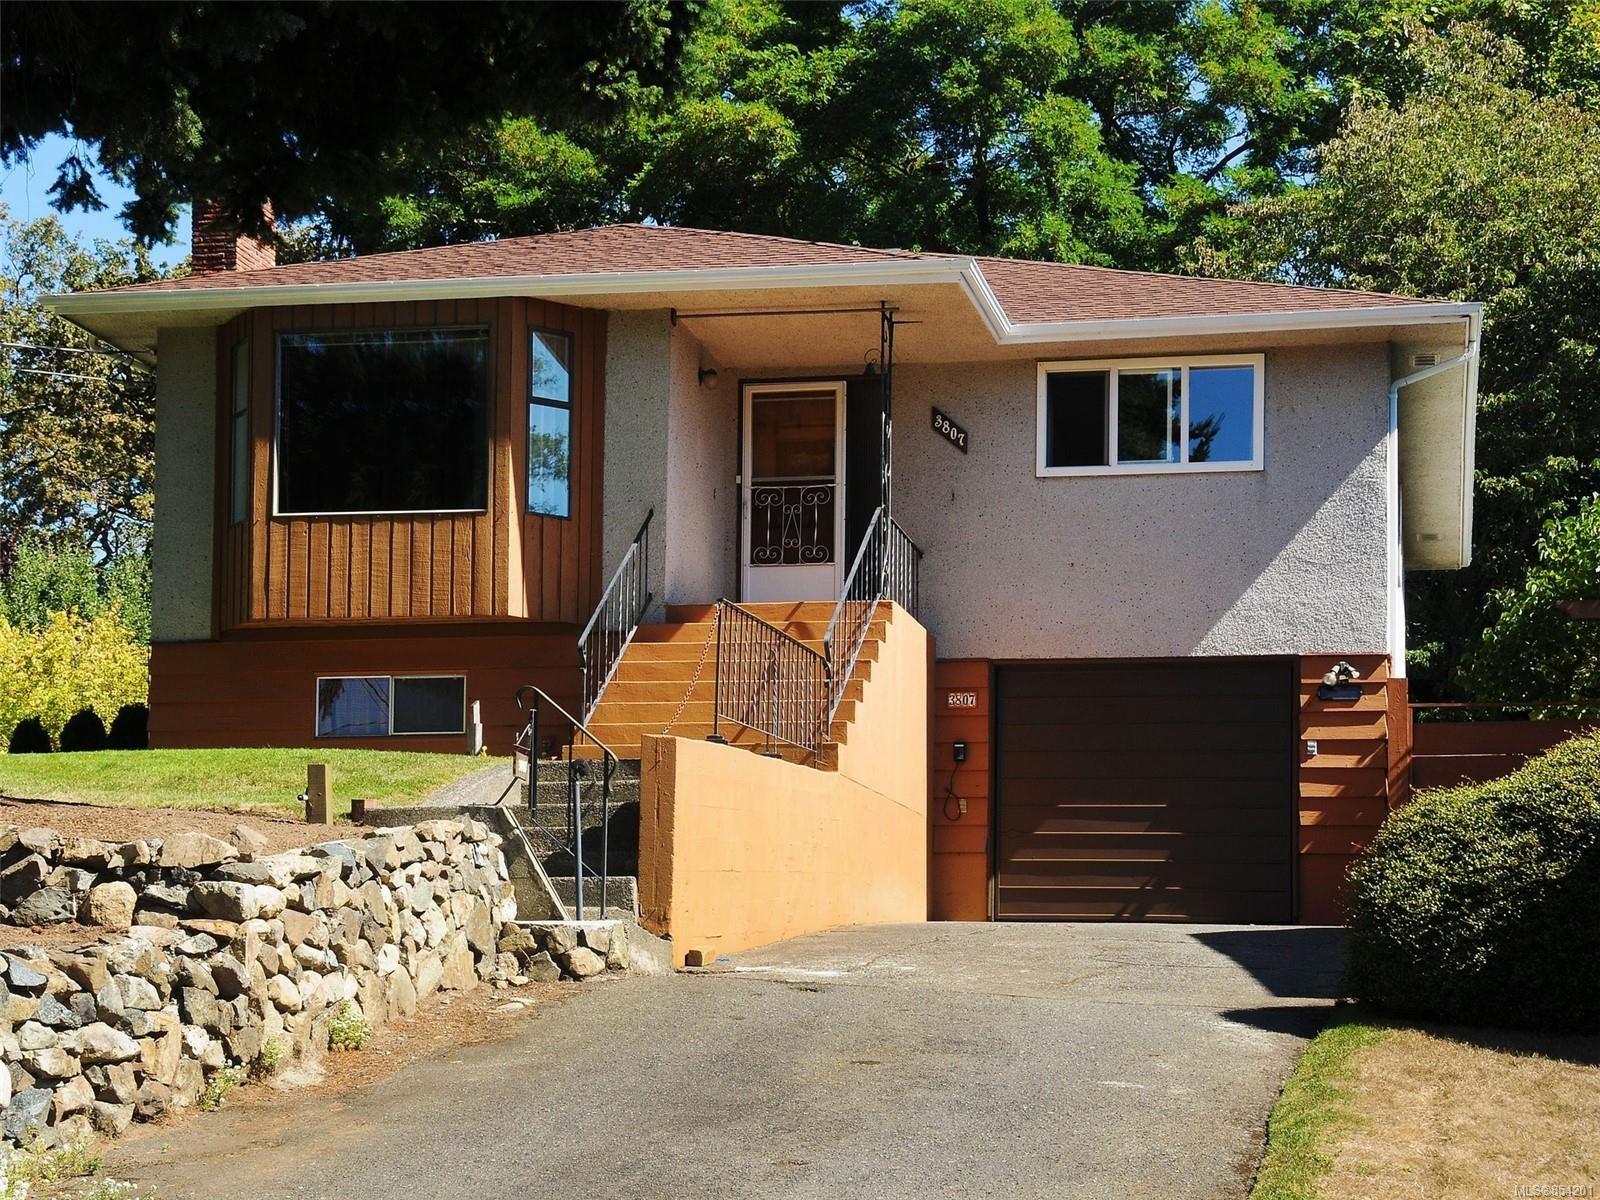 Main Photo: 3807 Merriman Dr in : SE Cedar Hill House for sale (Saanich East)  : MLS®# 854201